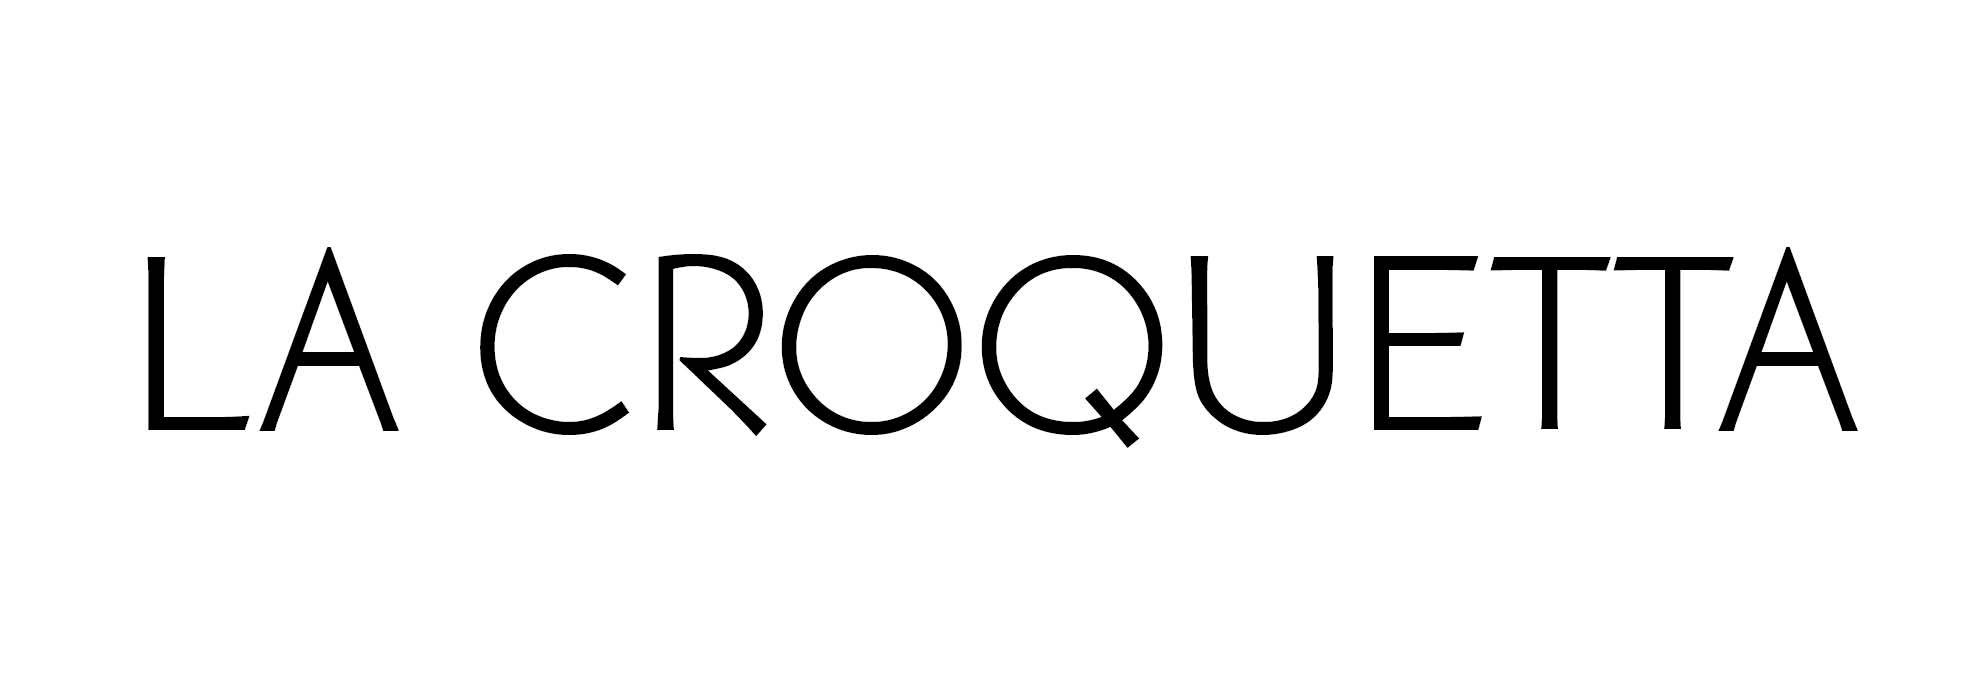 Logo_La Croquetta_light.jpg